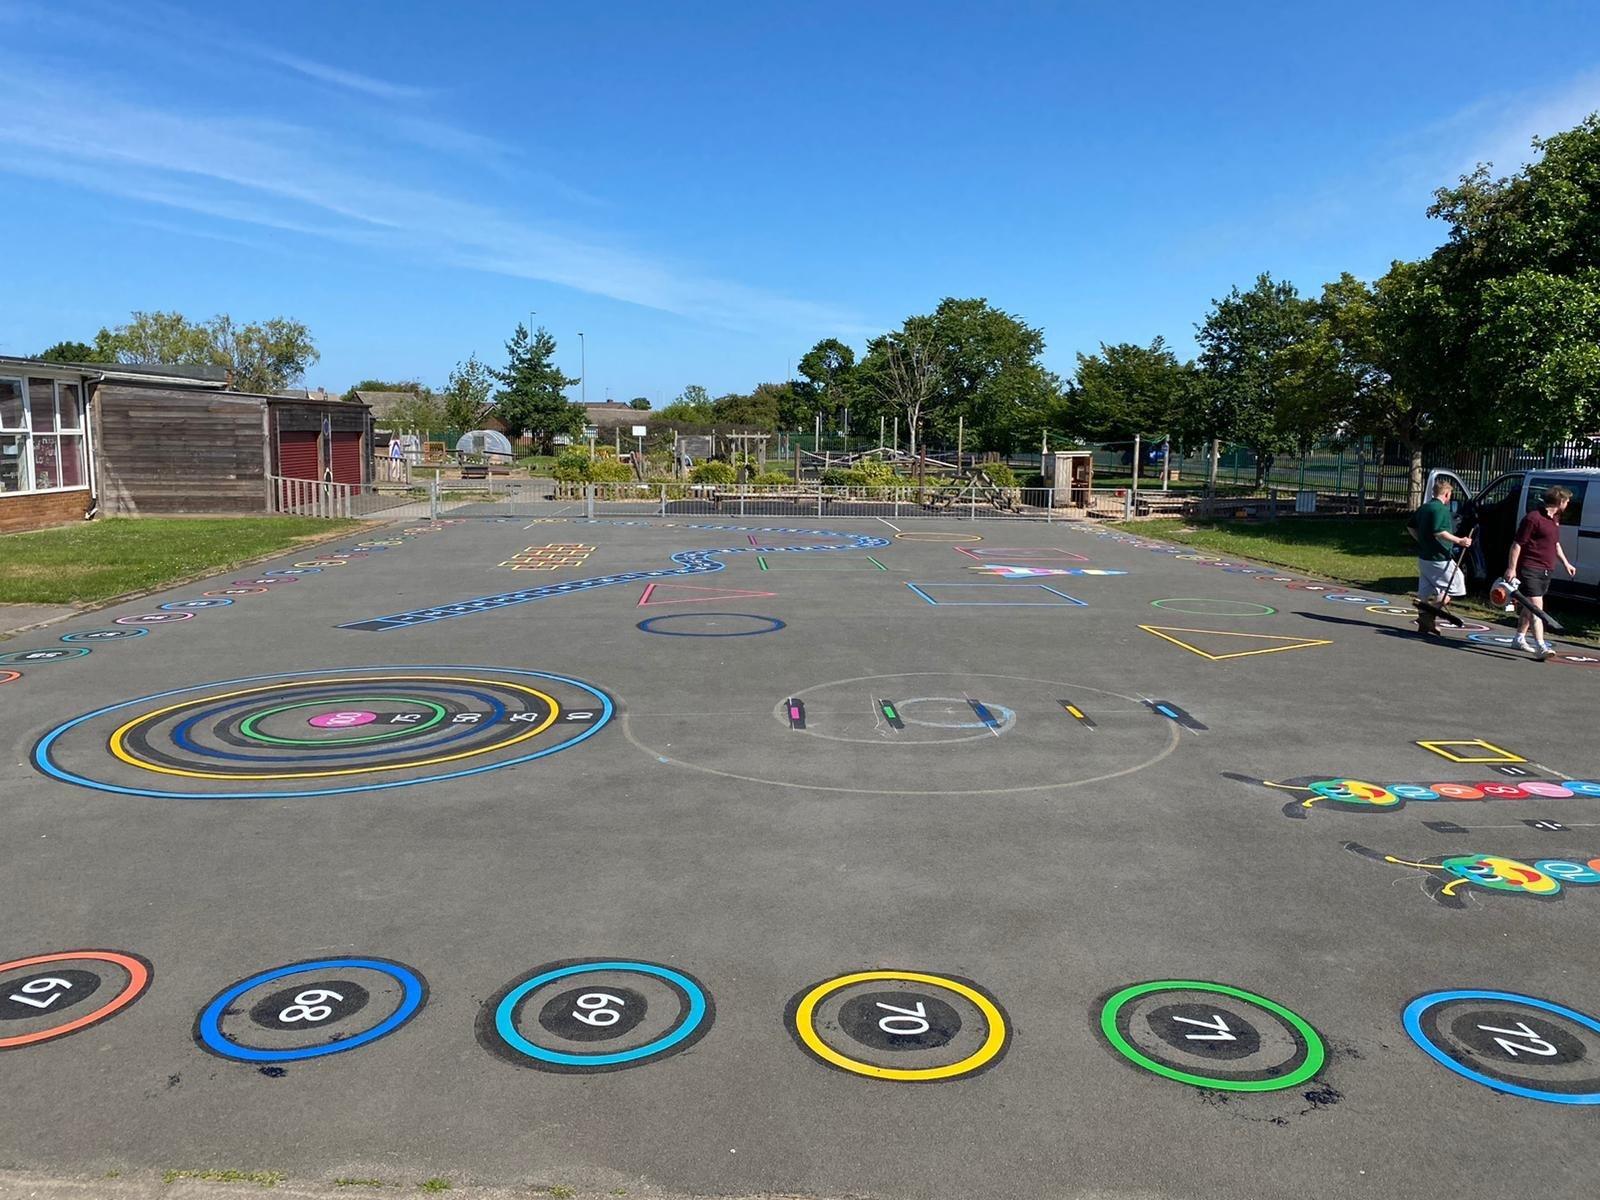 Bristol-Playground-Markings-2